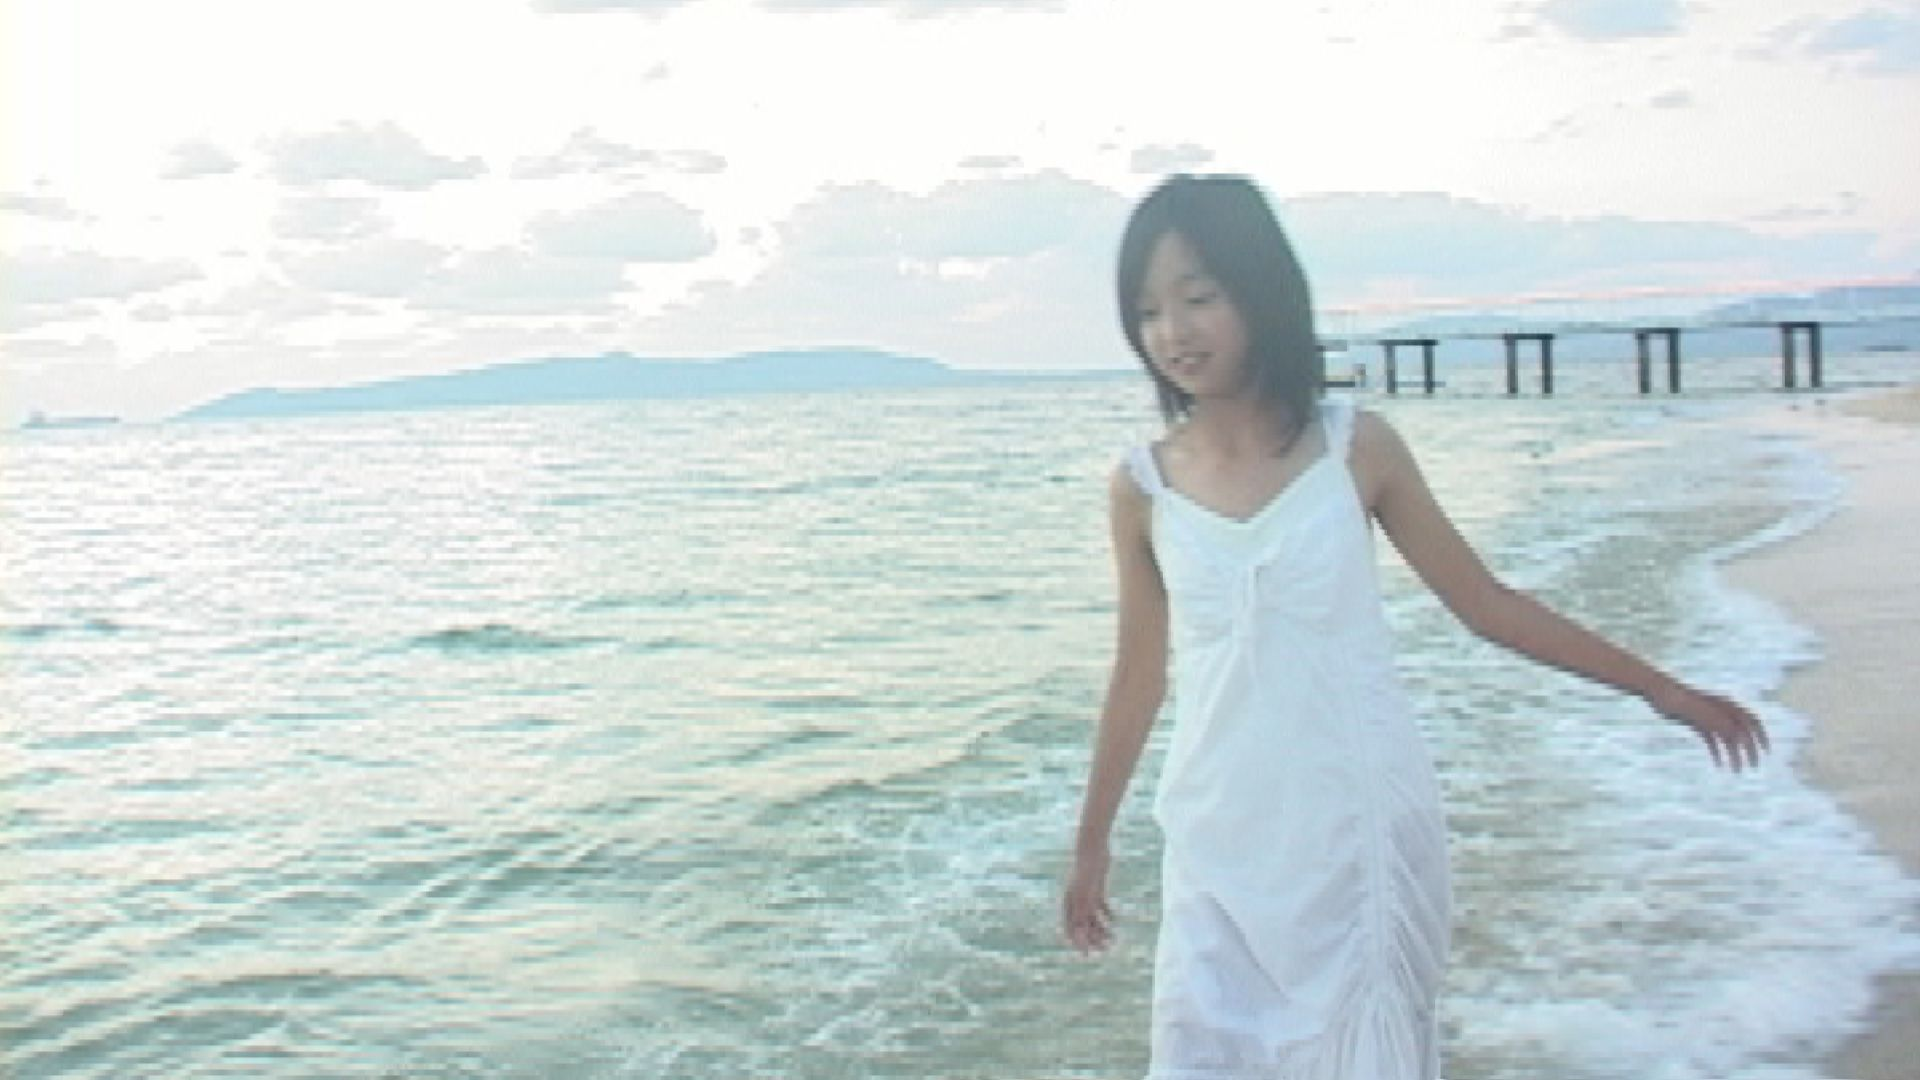 mayumi vol.1 / まゆみ 6